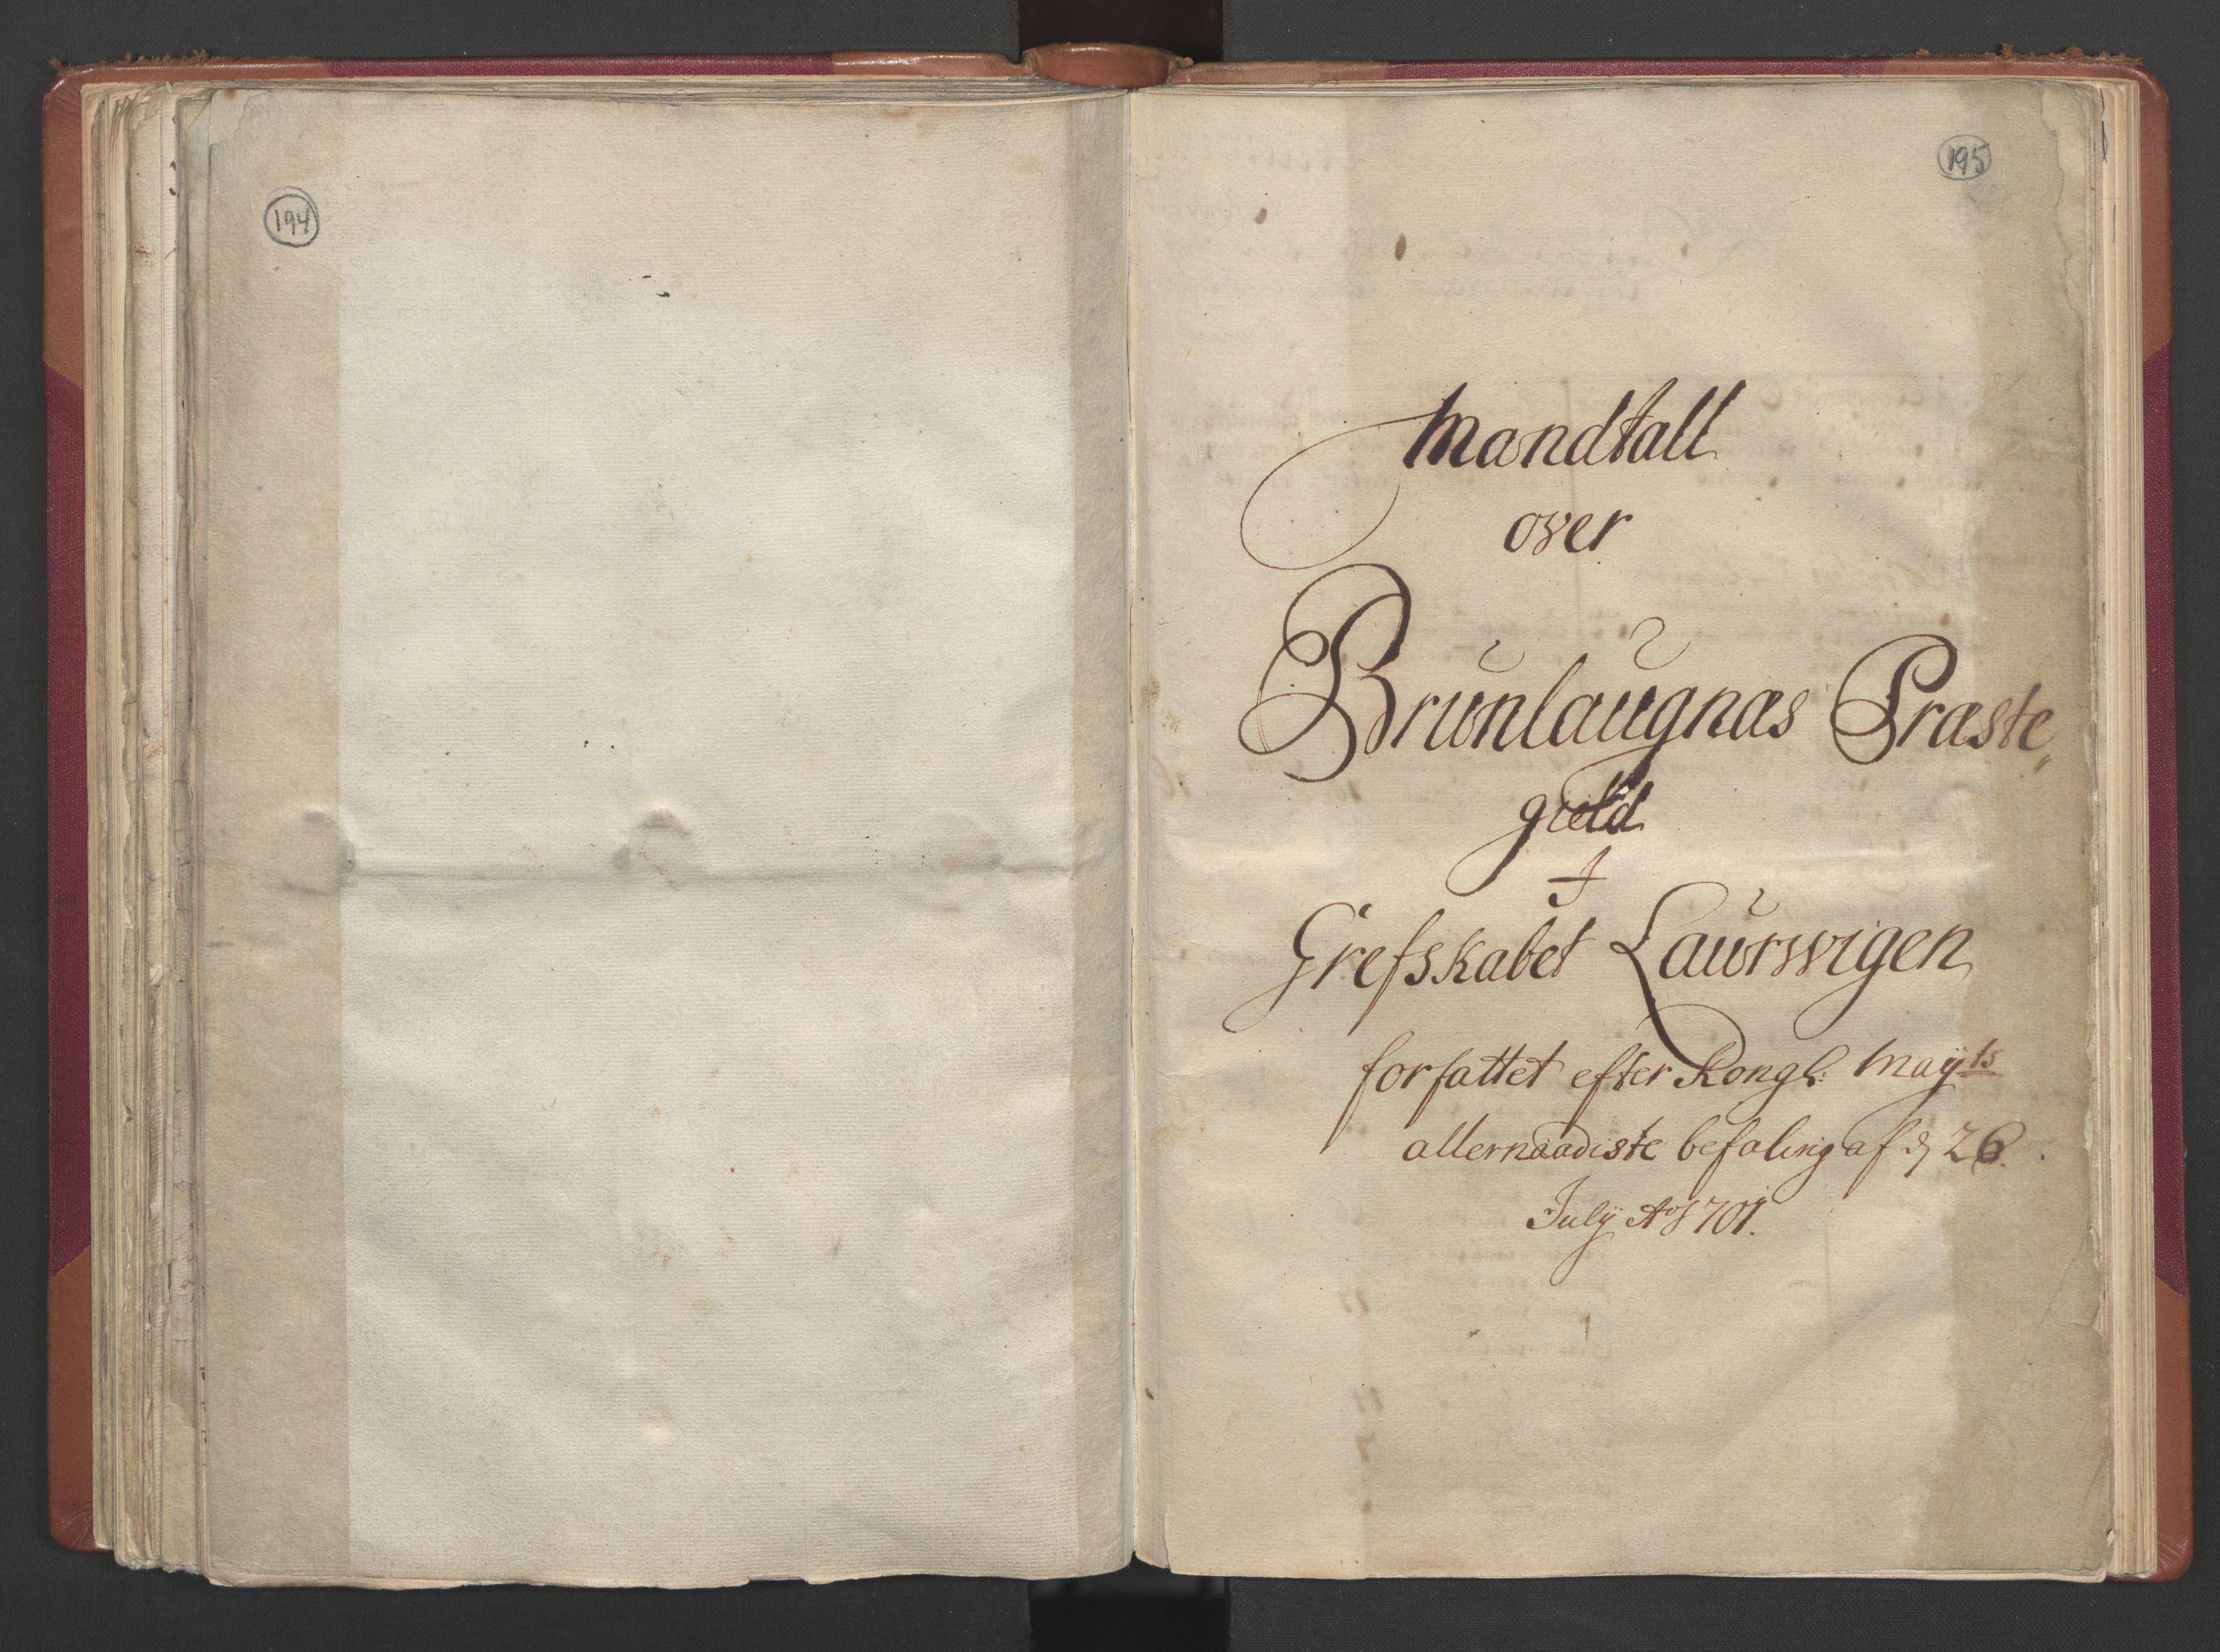 RA, Manntallet 1701, nr. 2: Solør, Odal og Østerdal fogderi og Larvik grevskap, 1701, s. 194-195